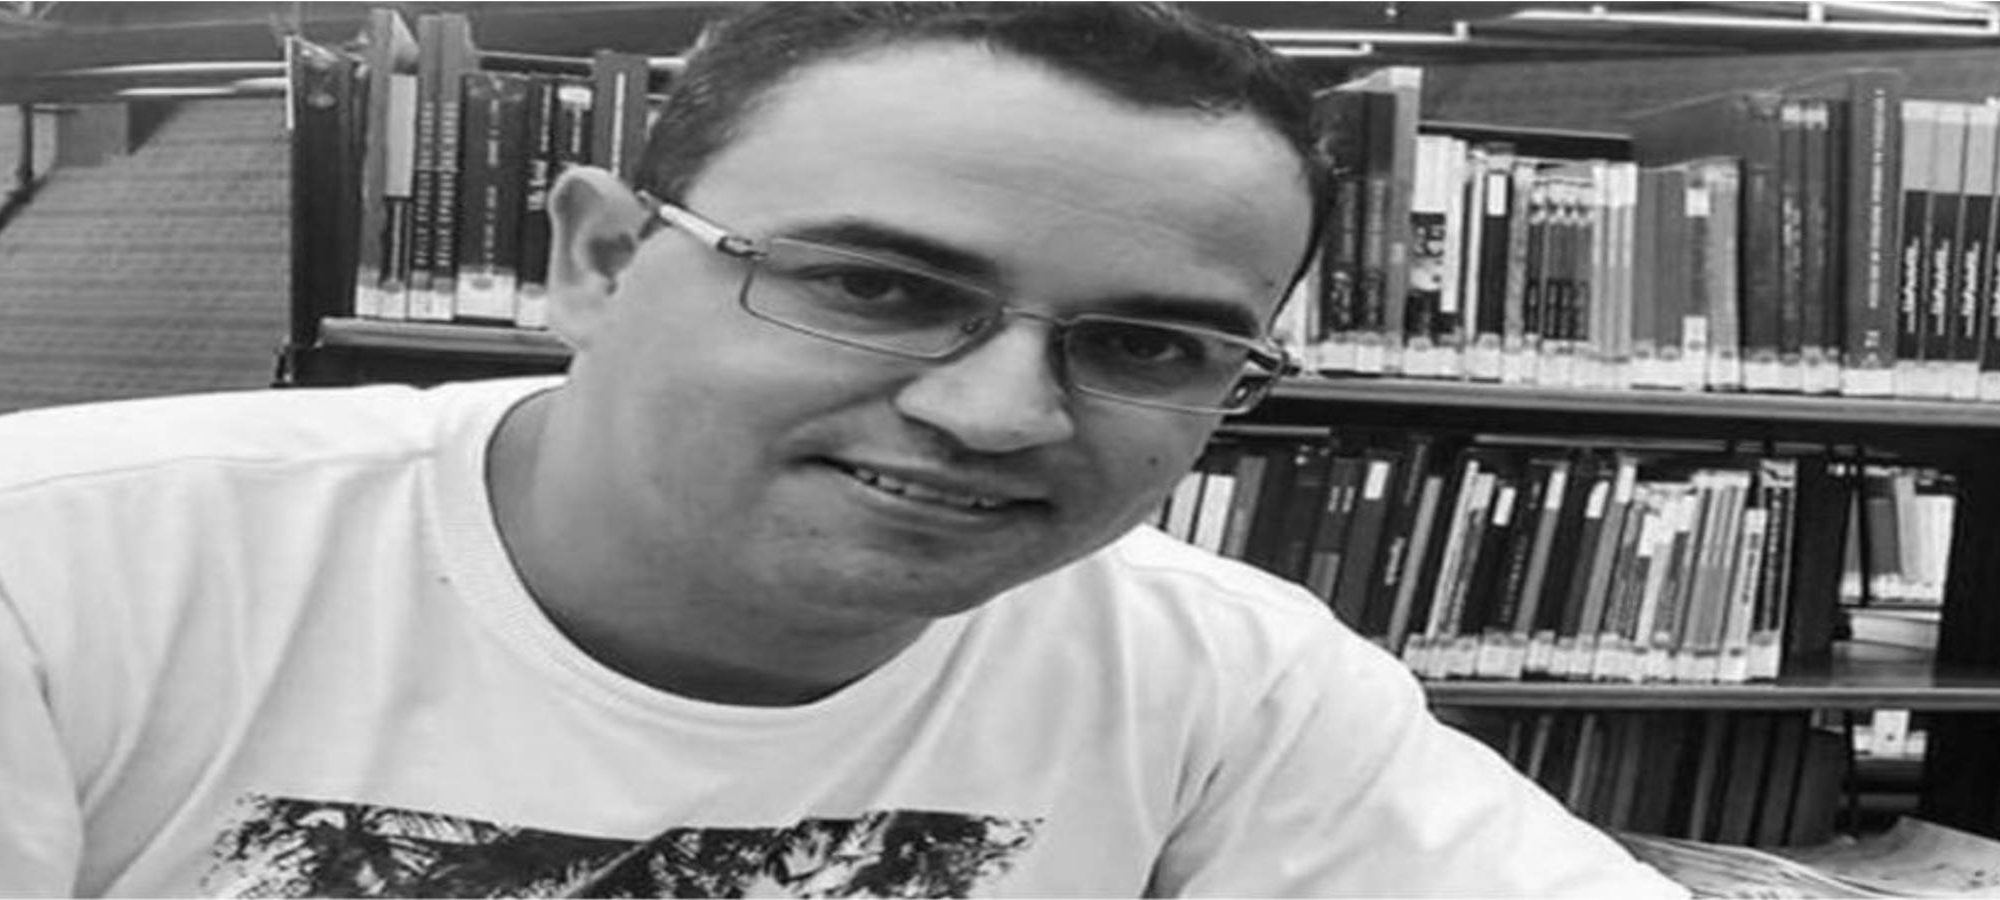 Poeta e escritor Julio Cantuaria - juliocantuaria